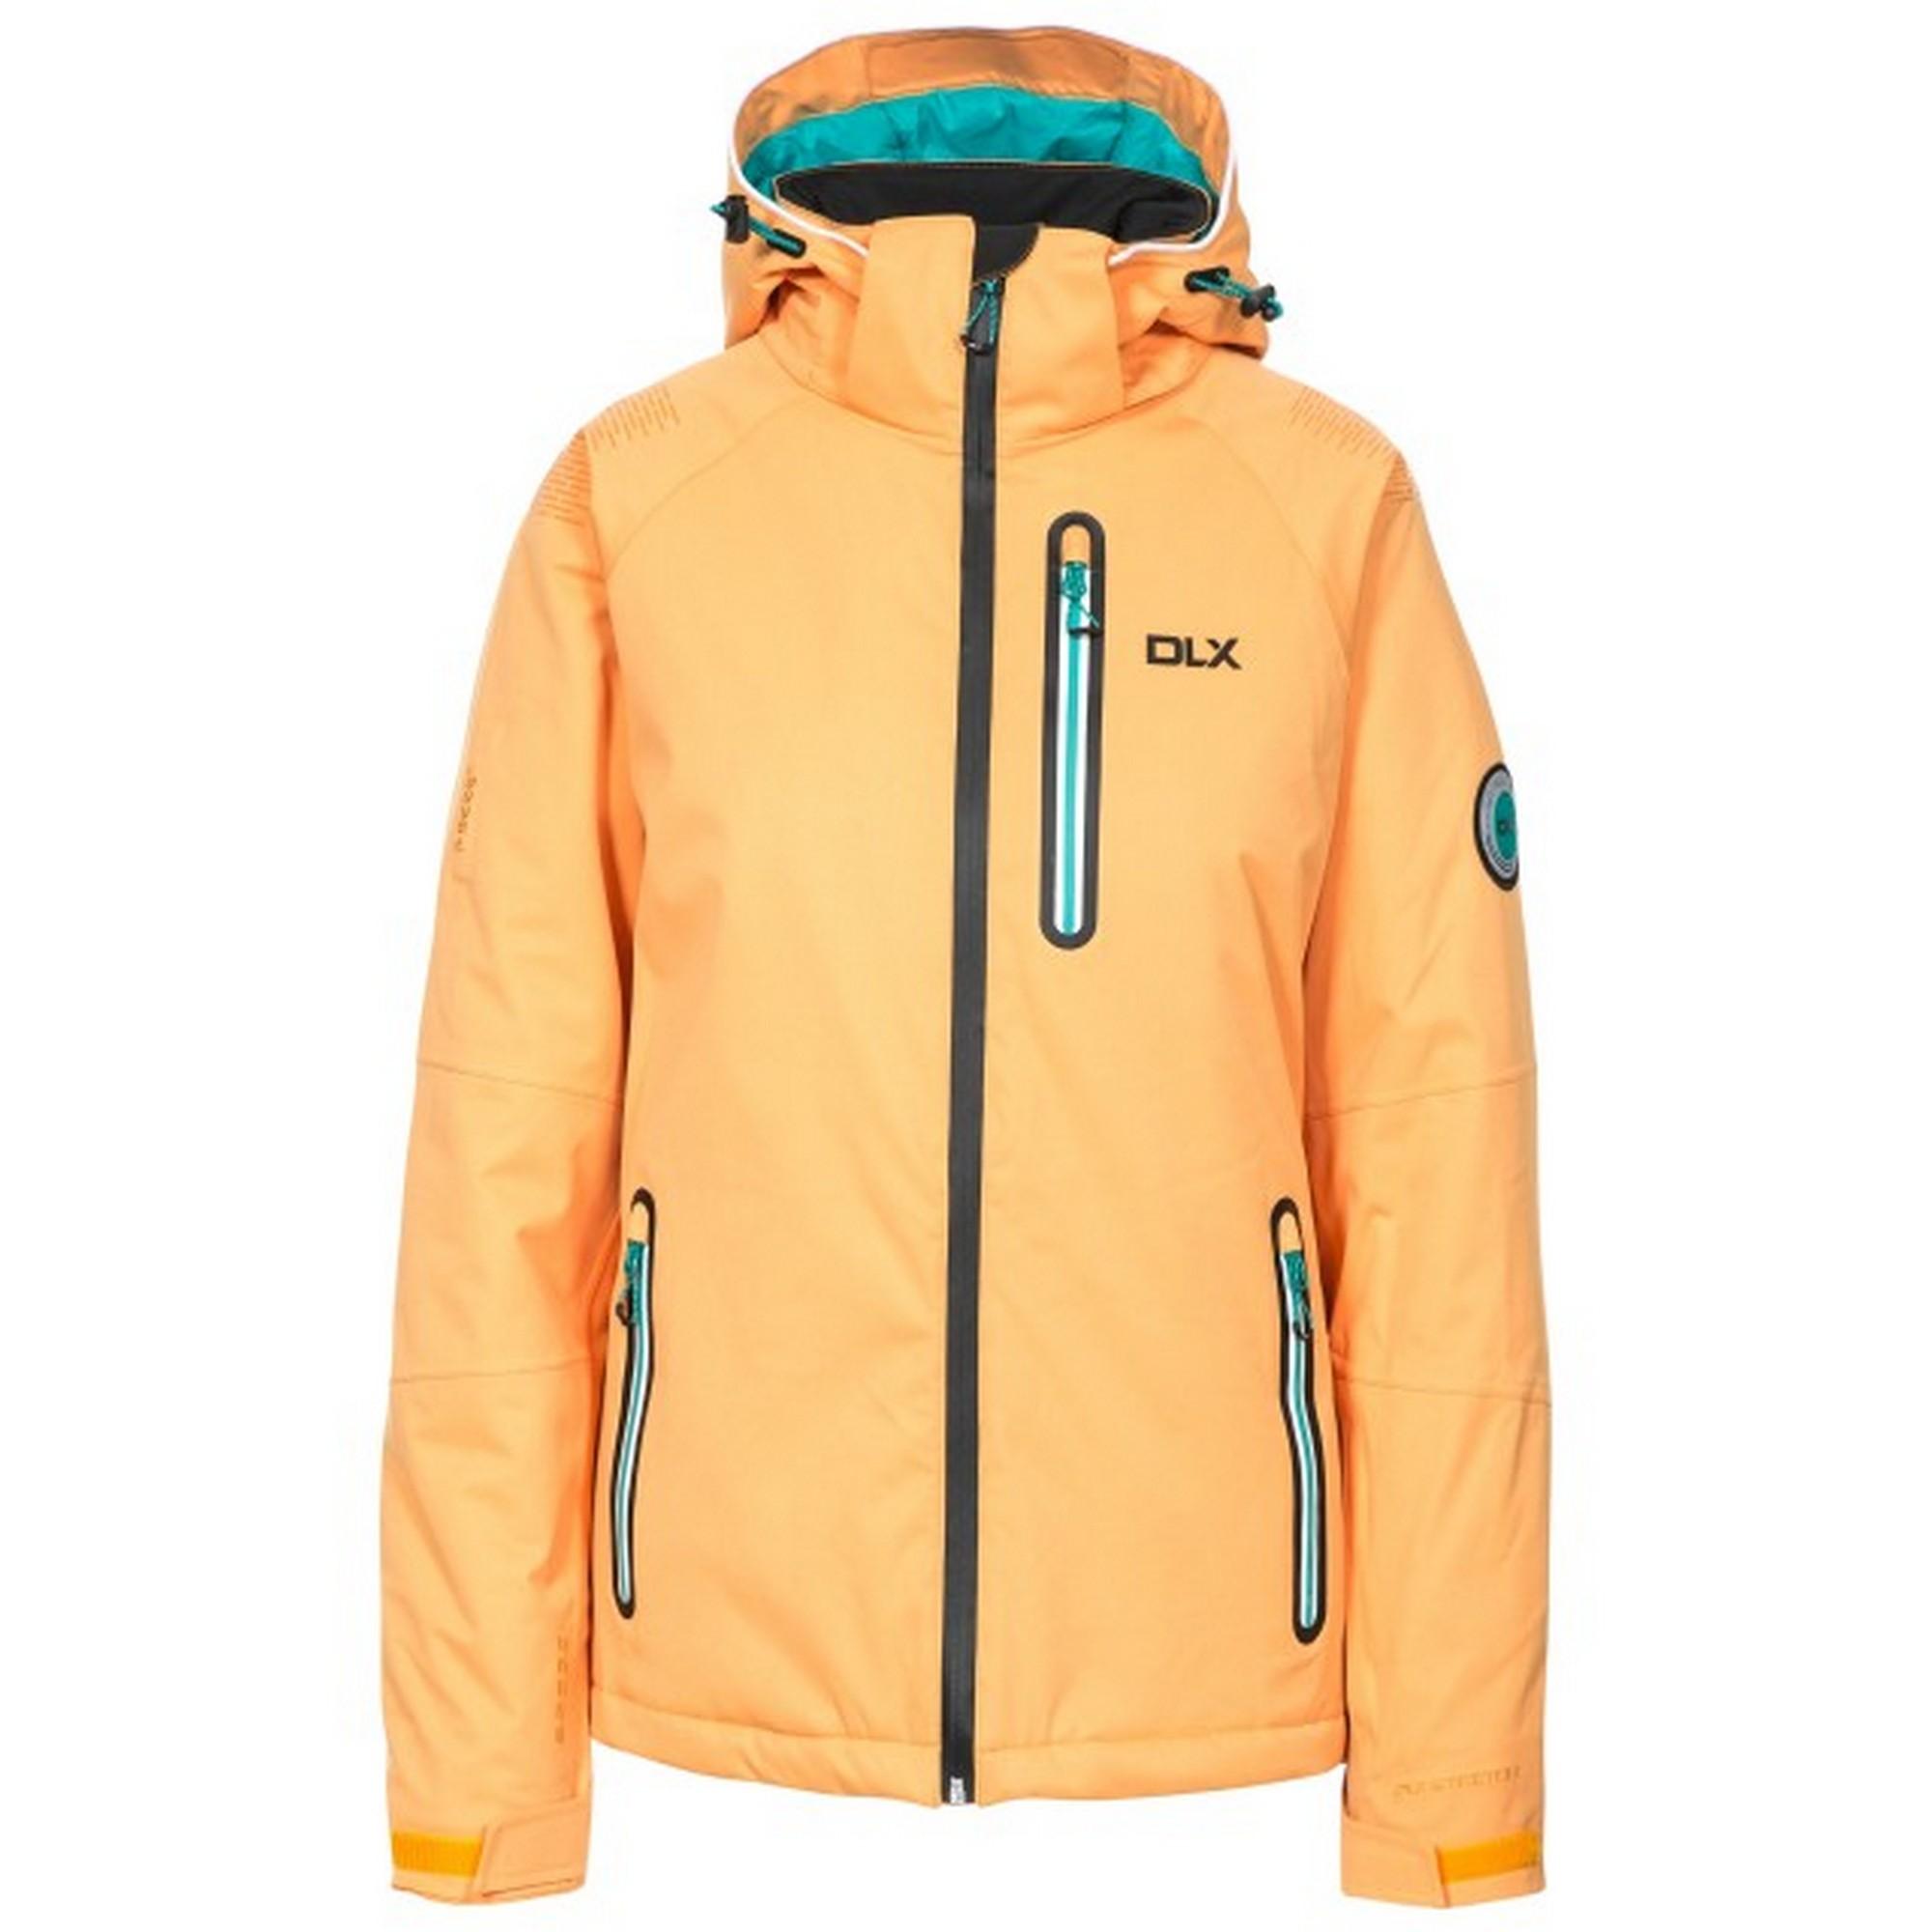 Trespass Skijacke Damen Nicolette   Sportbekleidung > Sportjacken > Skijacken   Orange   Trespass